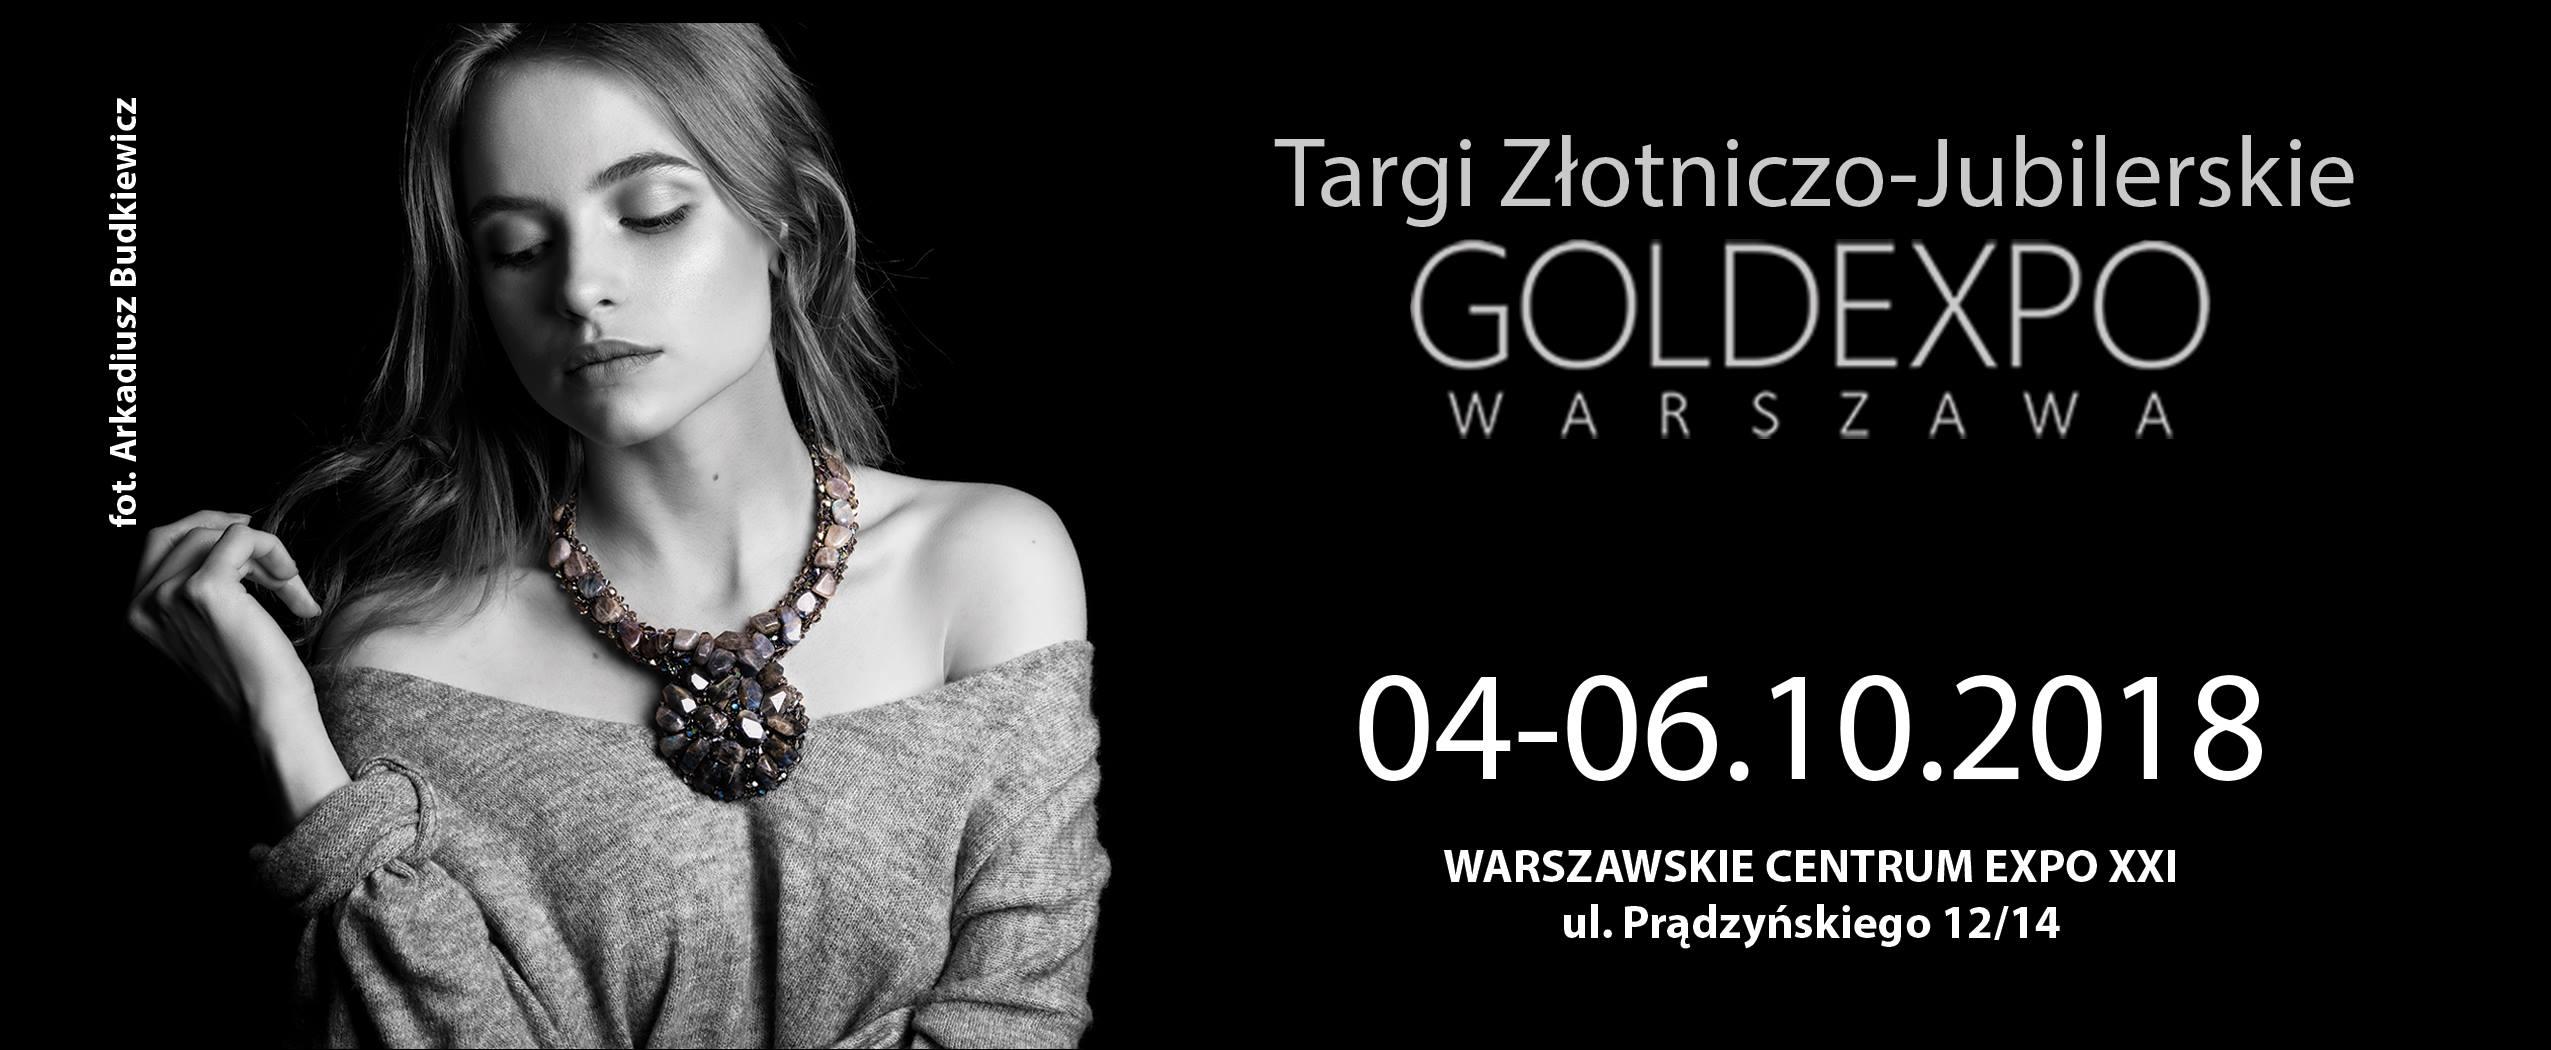 Targi GOLDEXPO 2018 / Warszawa